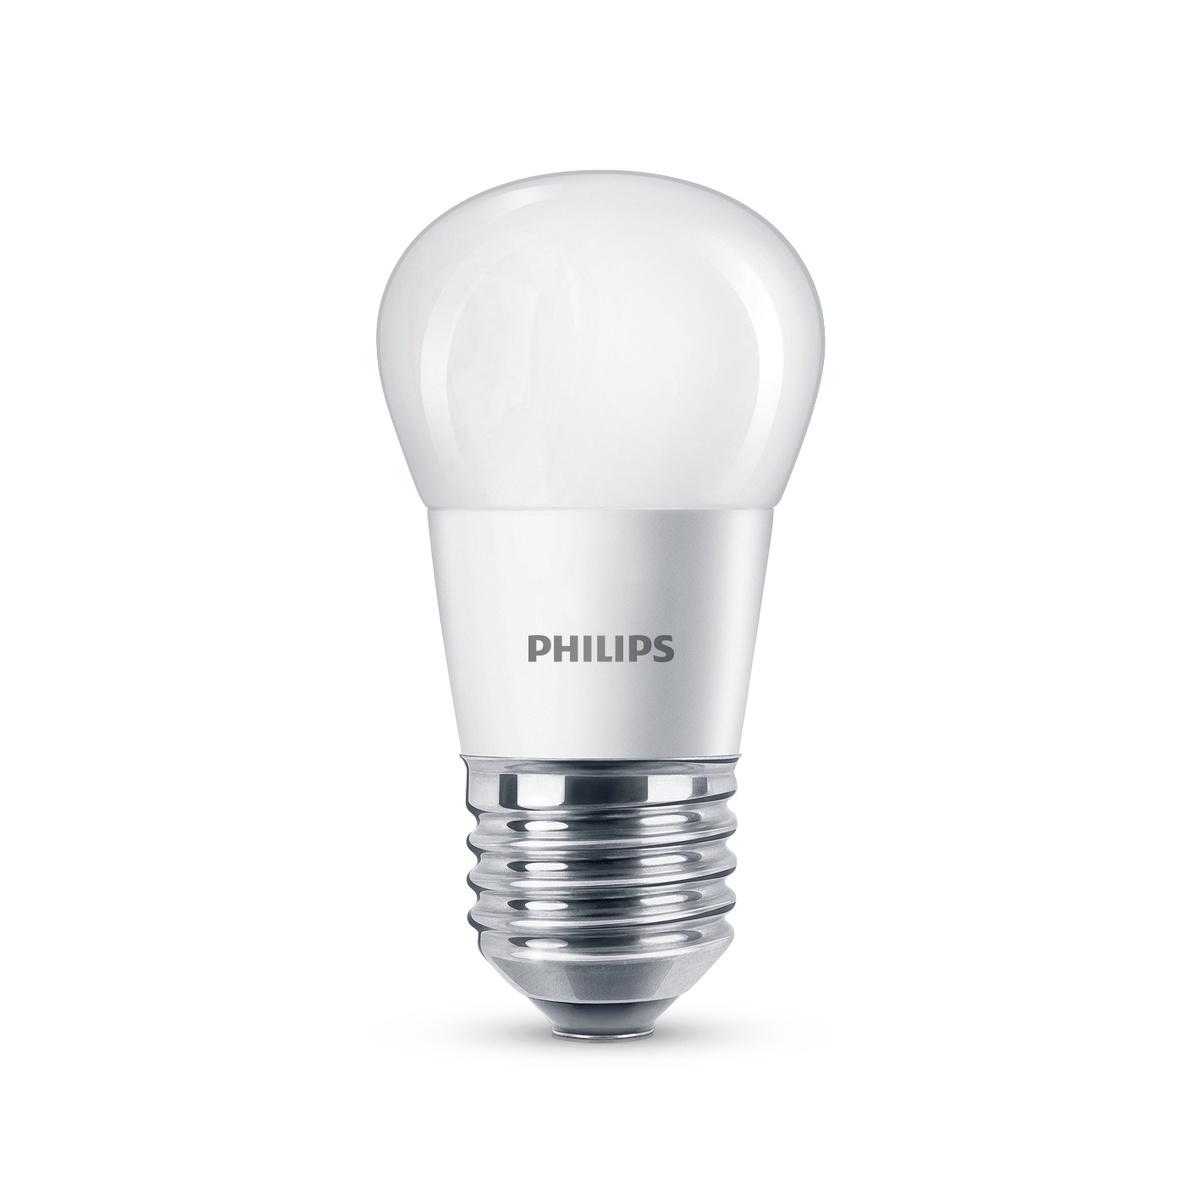 08d25d51361 Lambipirn Philips 5,5W LED E27 P45 470LM